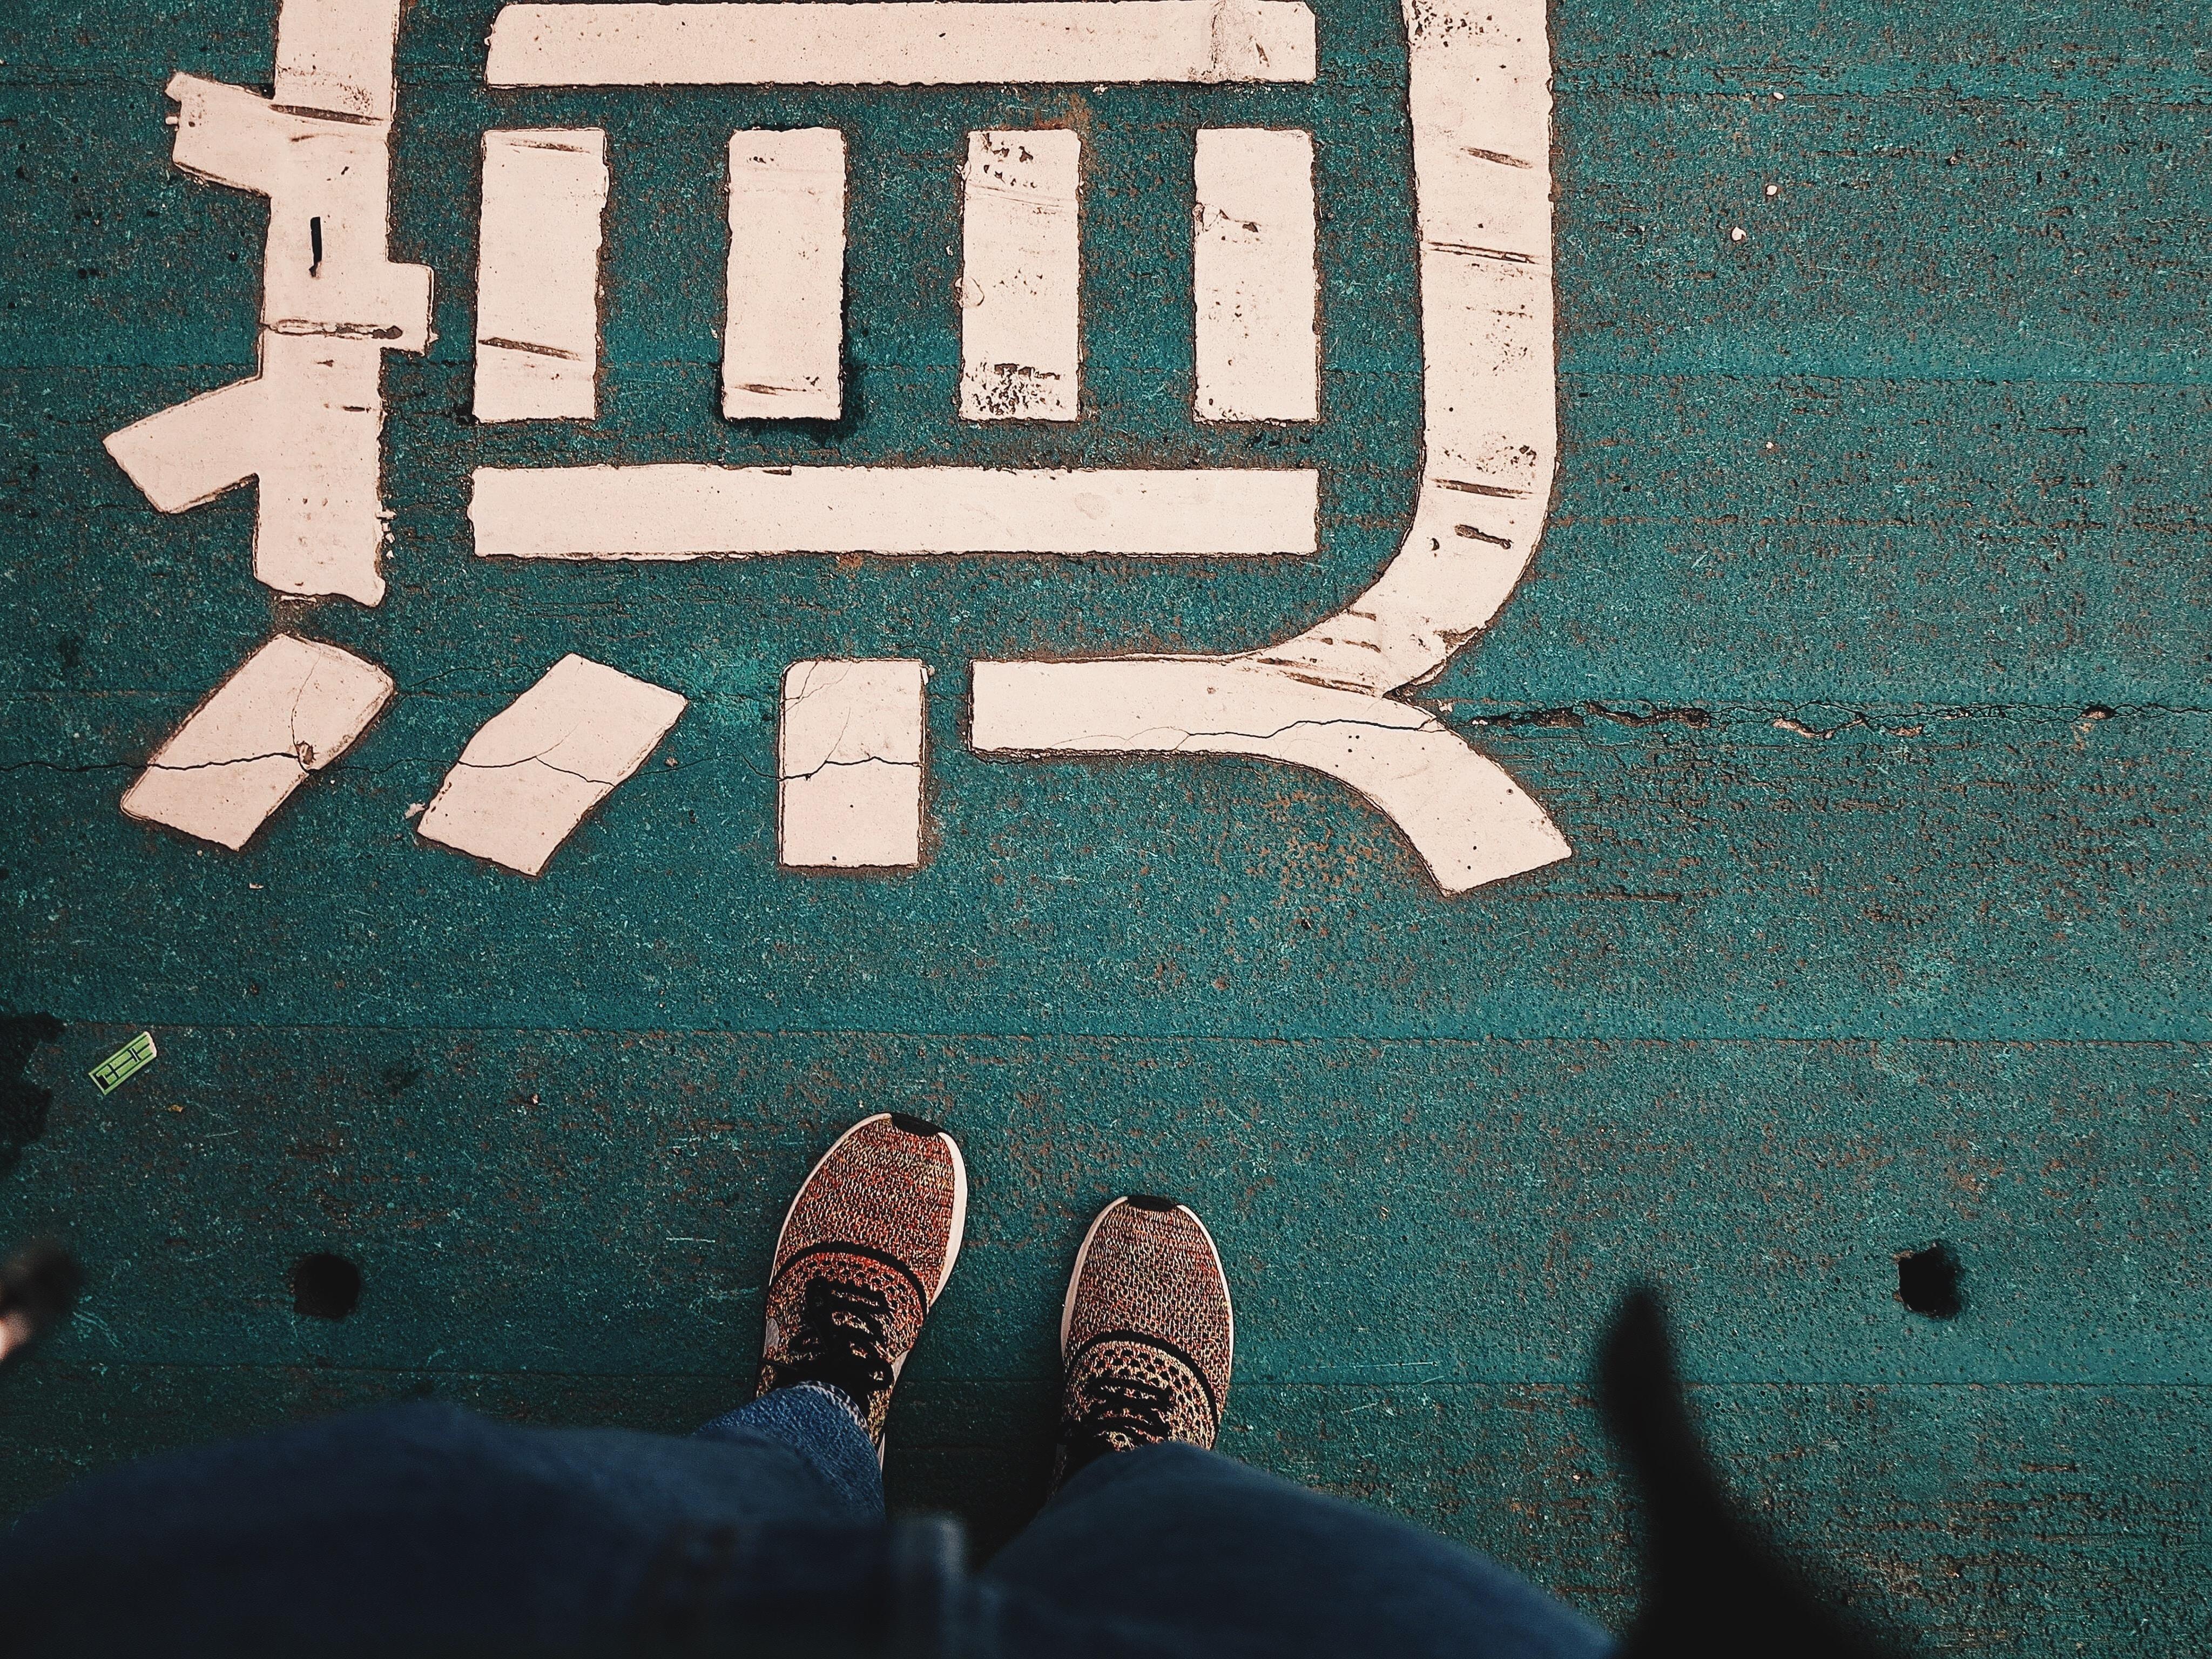 person standing on green floor